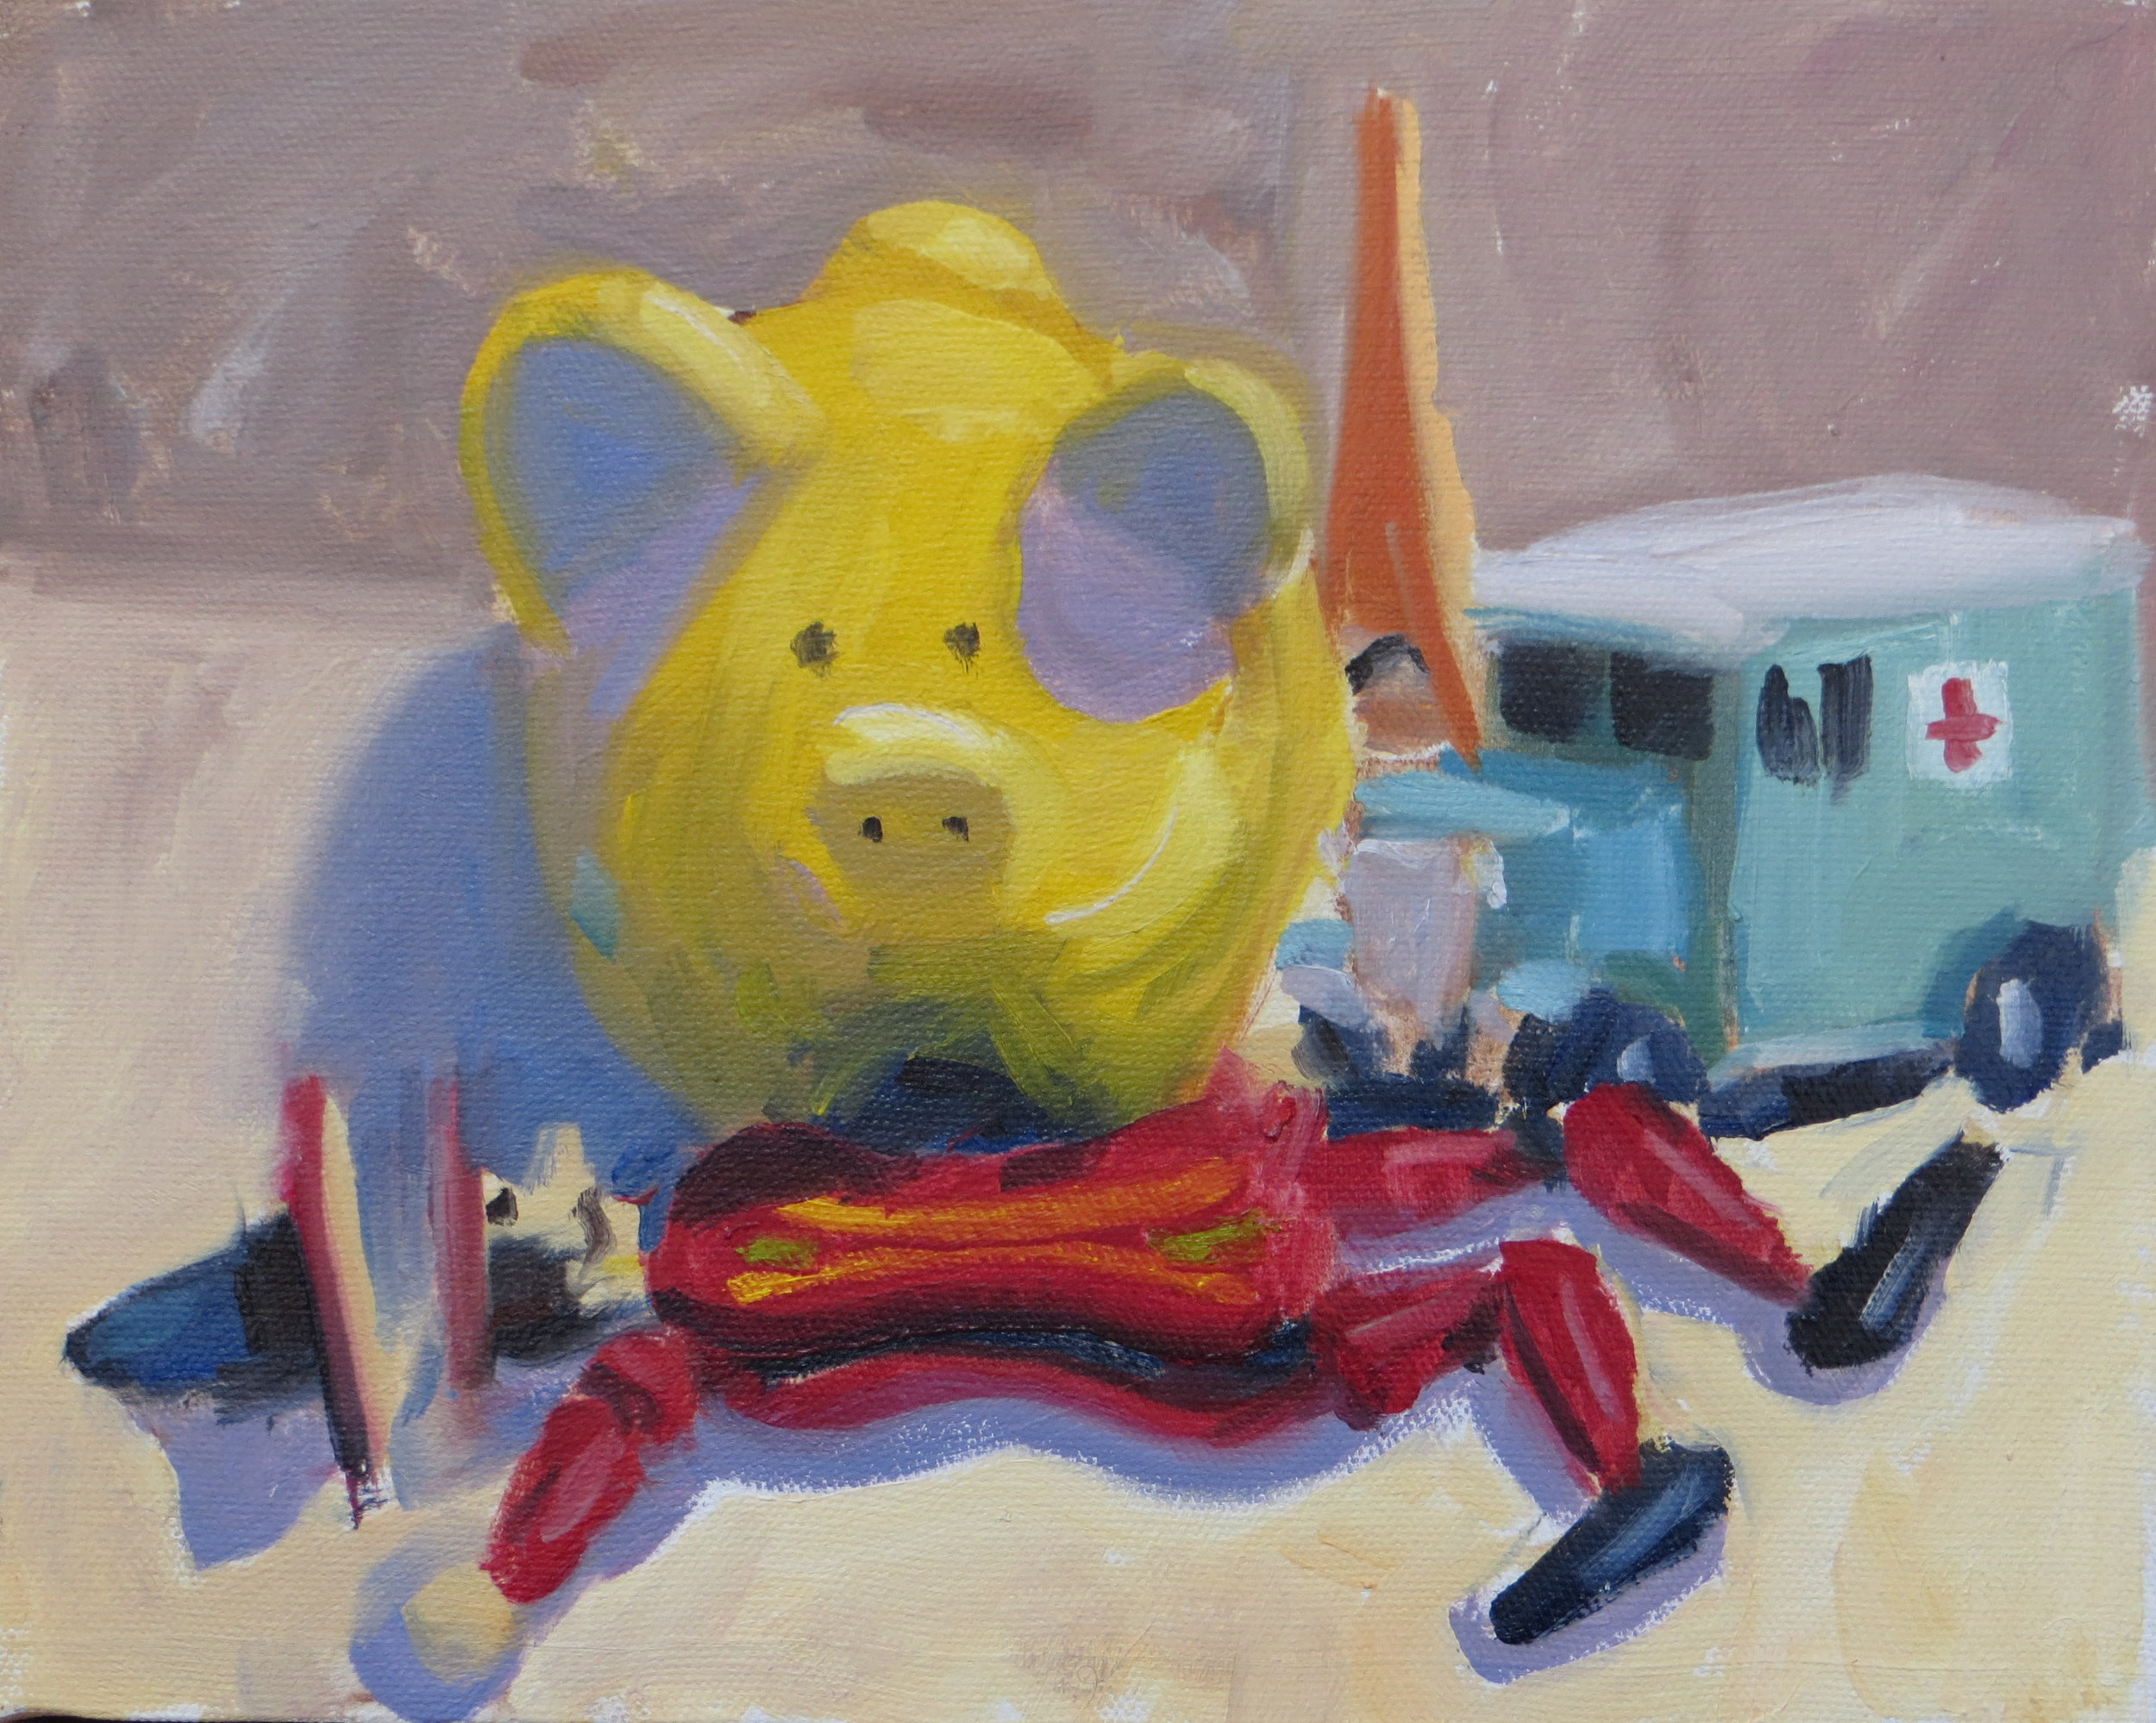 Still Life Stuyd wiht Pig 8x10 oil on canvas 2014.jpg